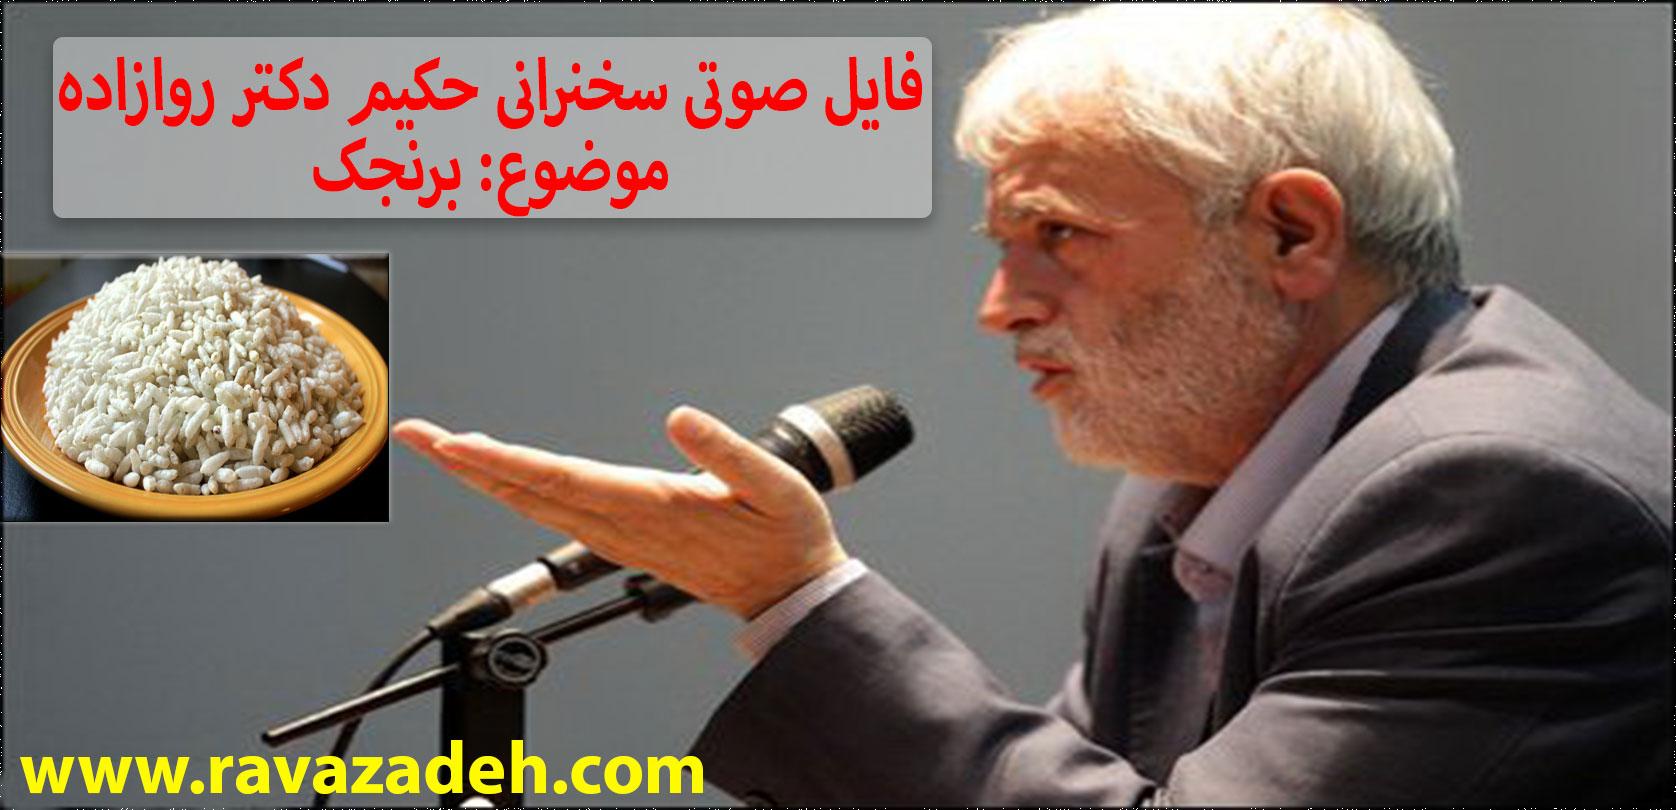 Photo of برنج خارجی تقلبی+ فایل صوتی سخنرانی حکیم دکتر روازاده